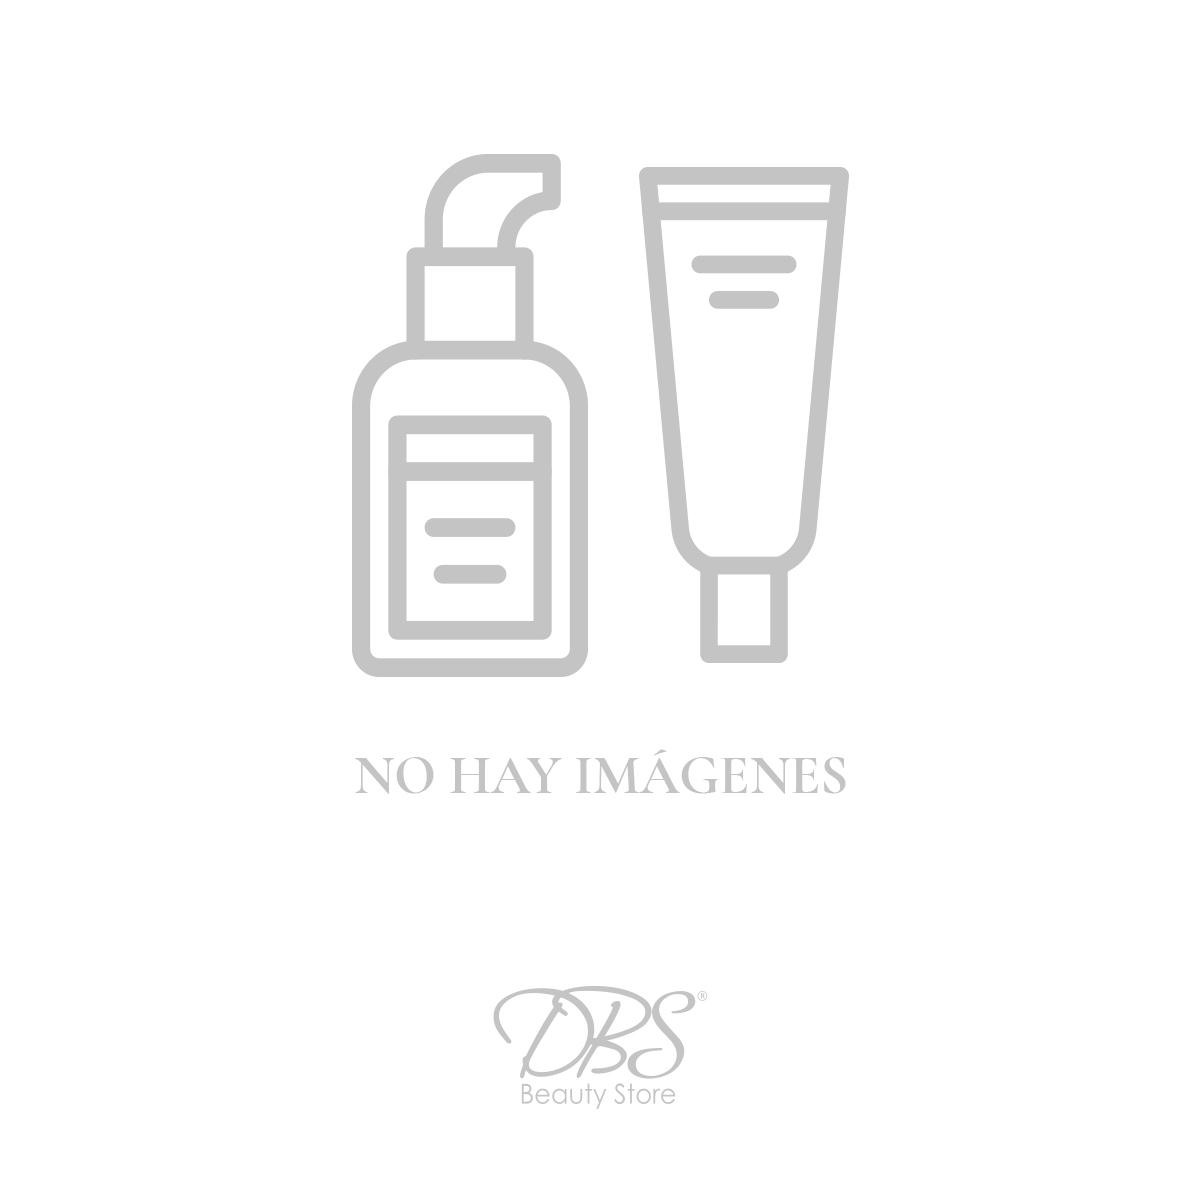 body-luxuries-BL-XC1907-MP.jpg